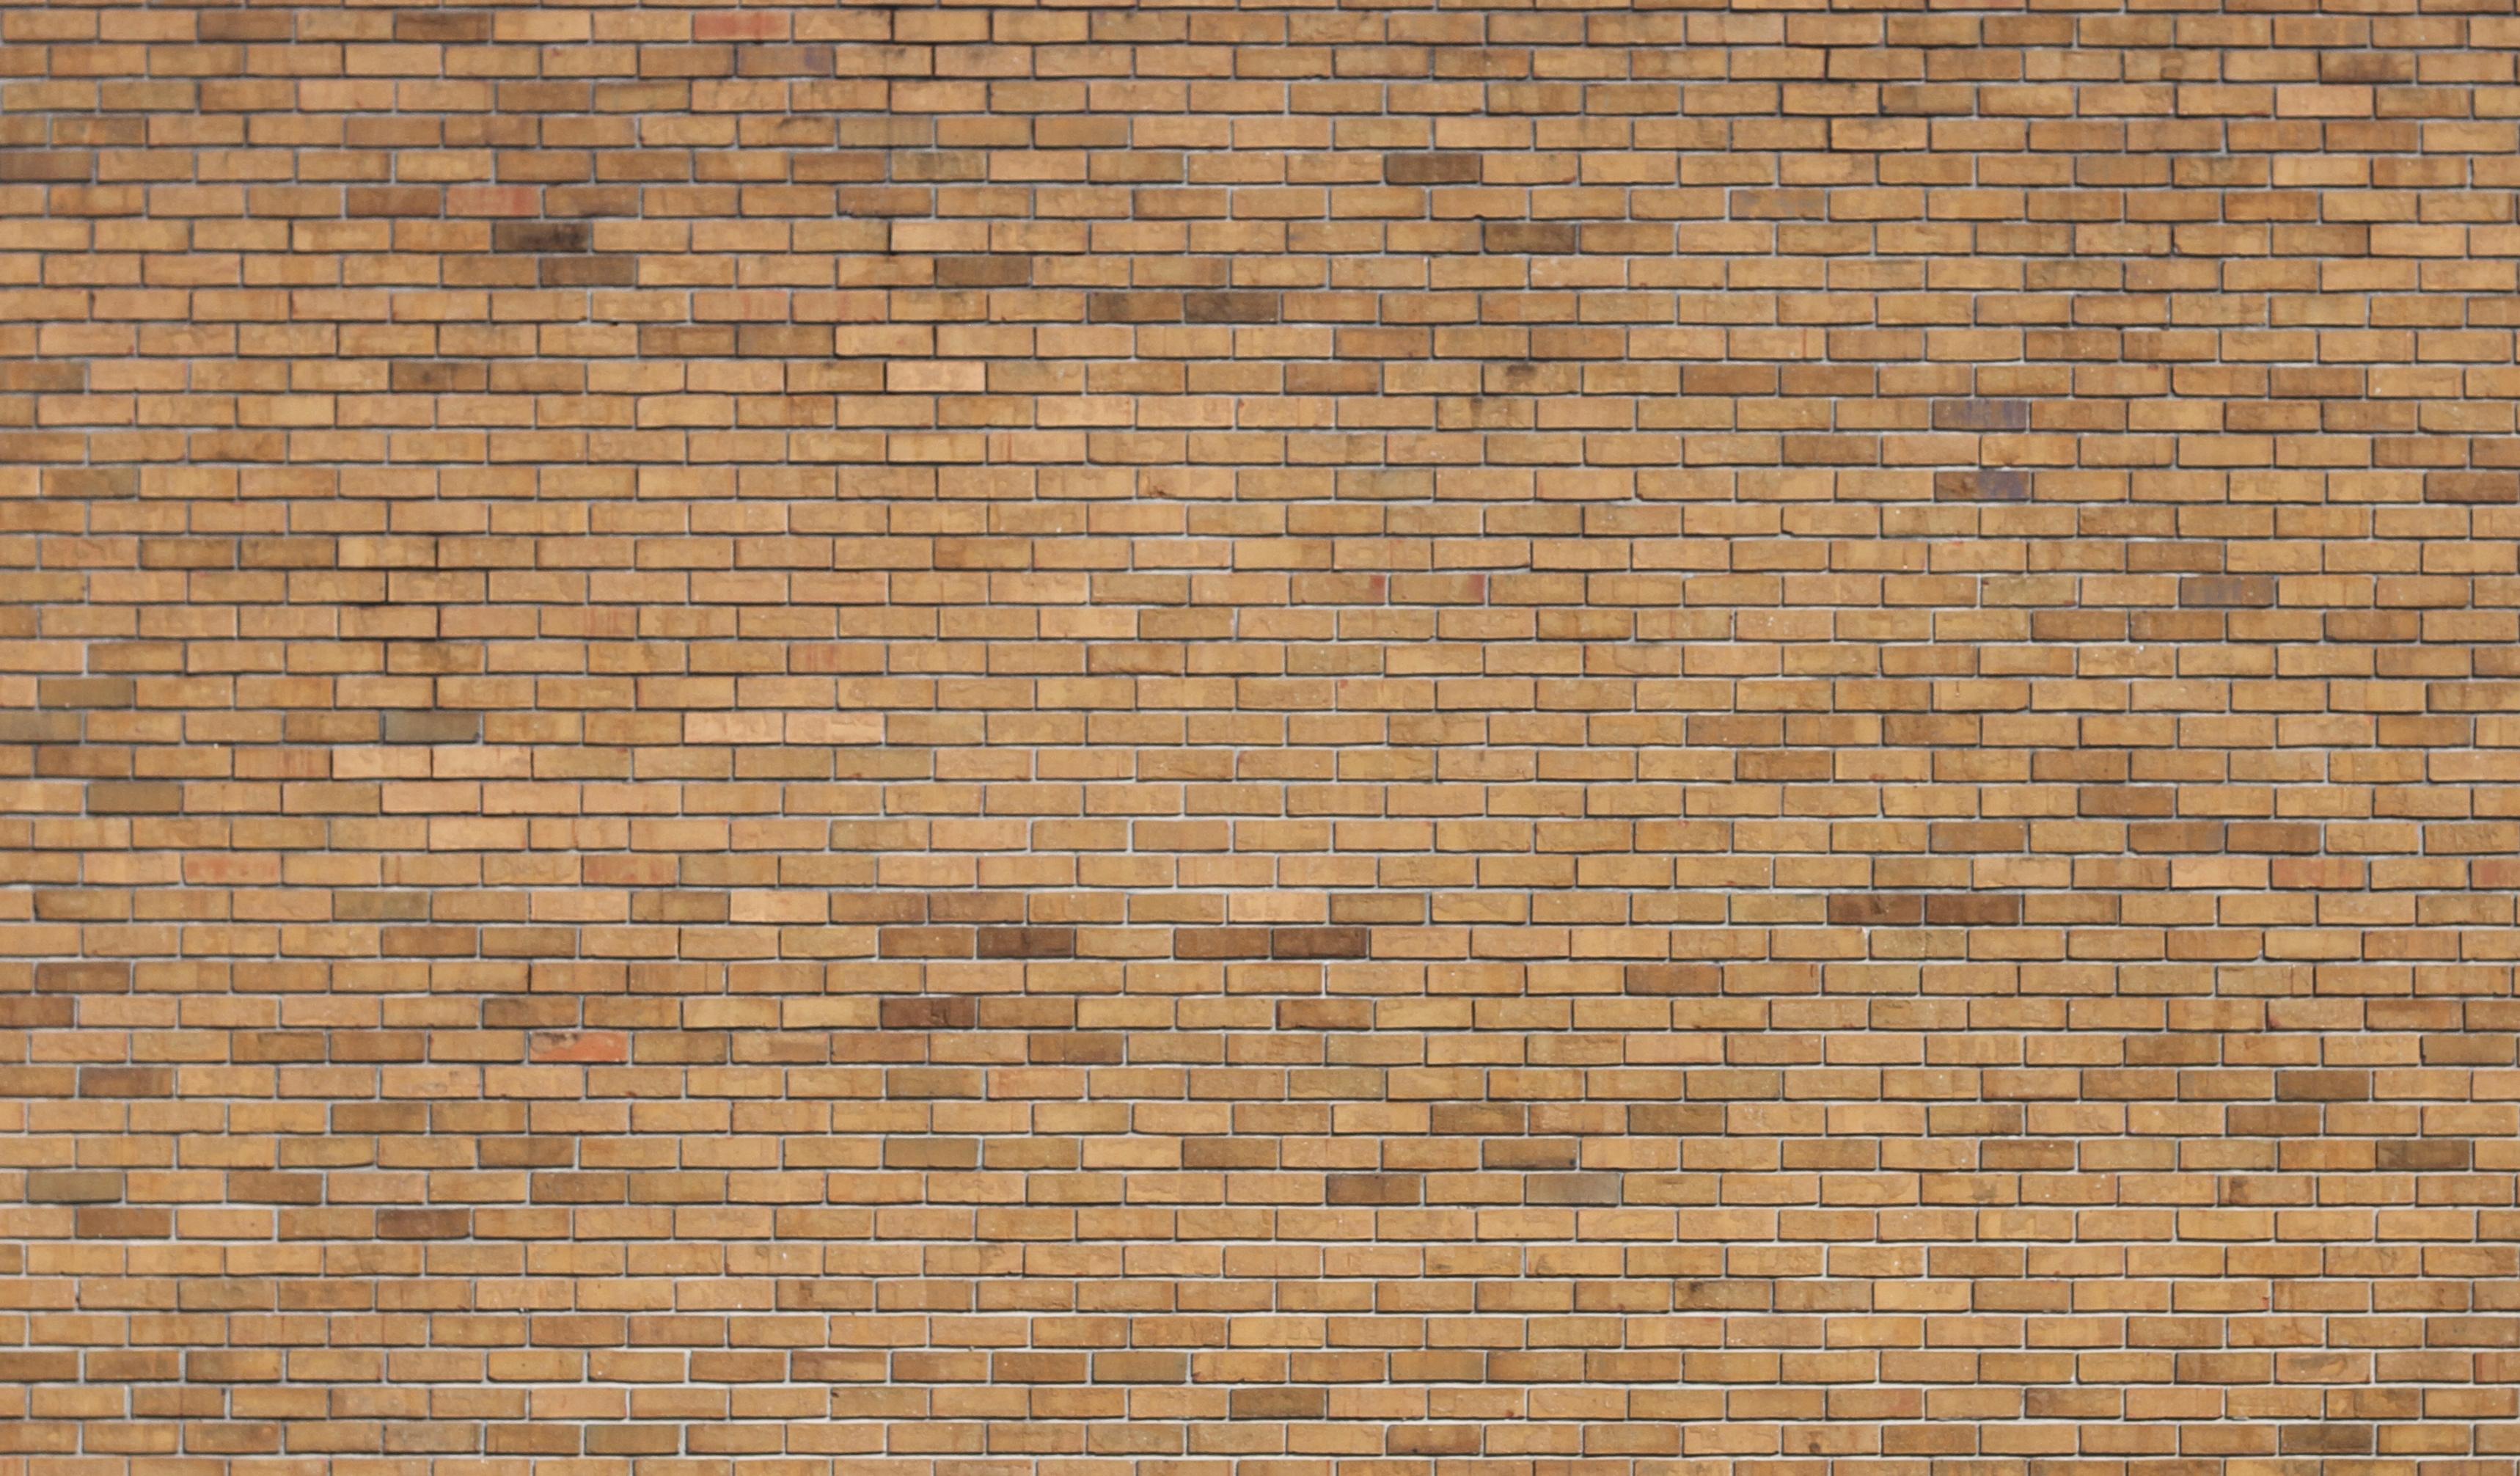 Orange Brick Texture - 14Textures